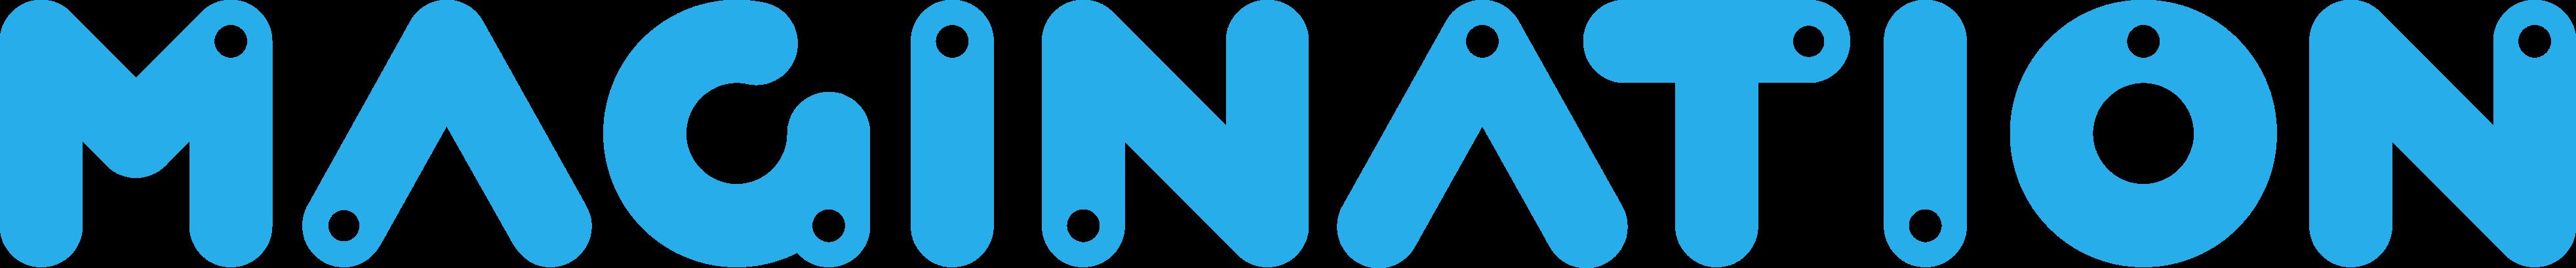 Magination logo